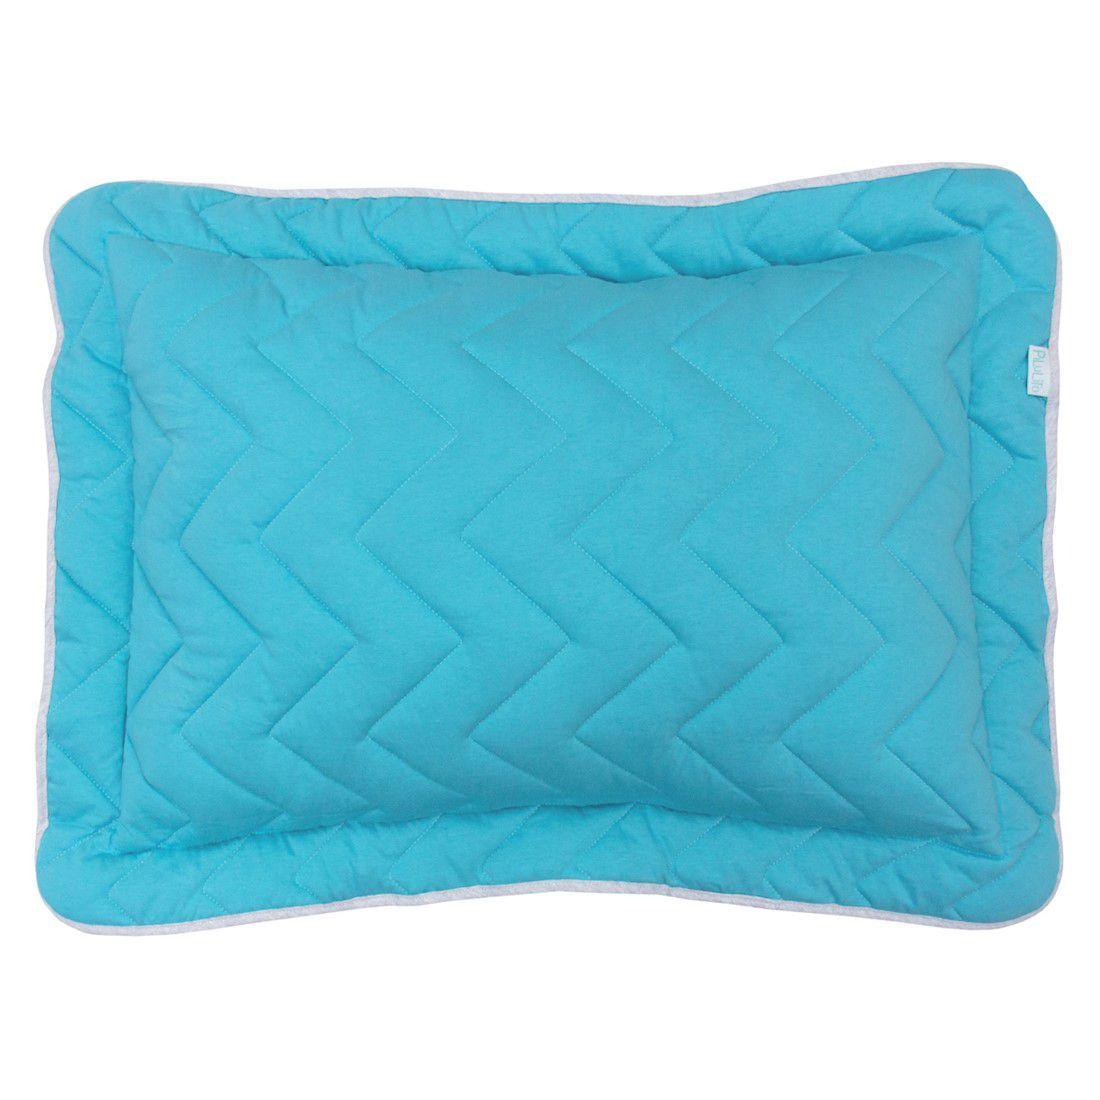 Porta travesseiro em malha chevron 70x50cm azul turquesa